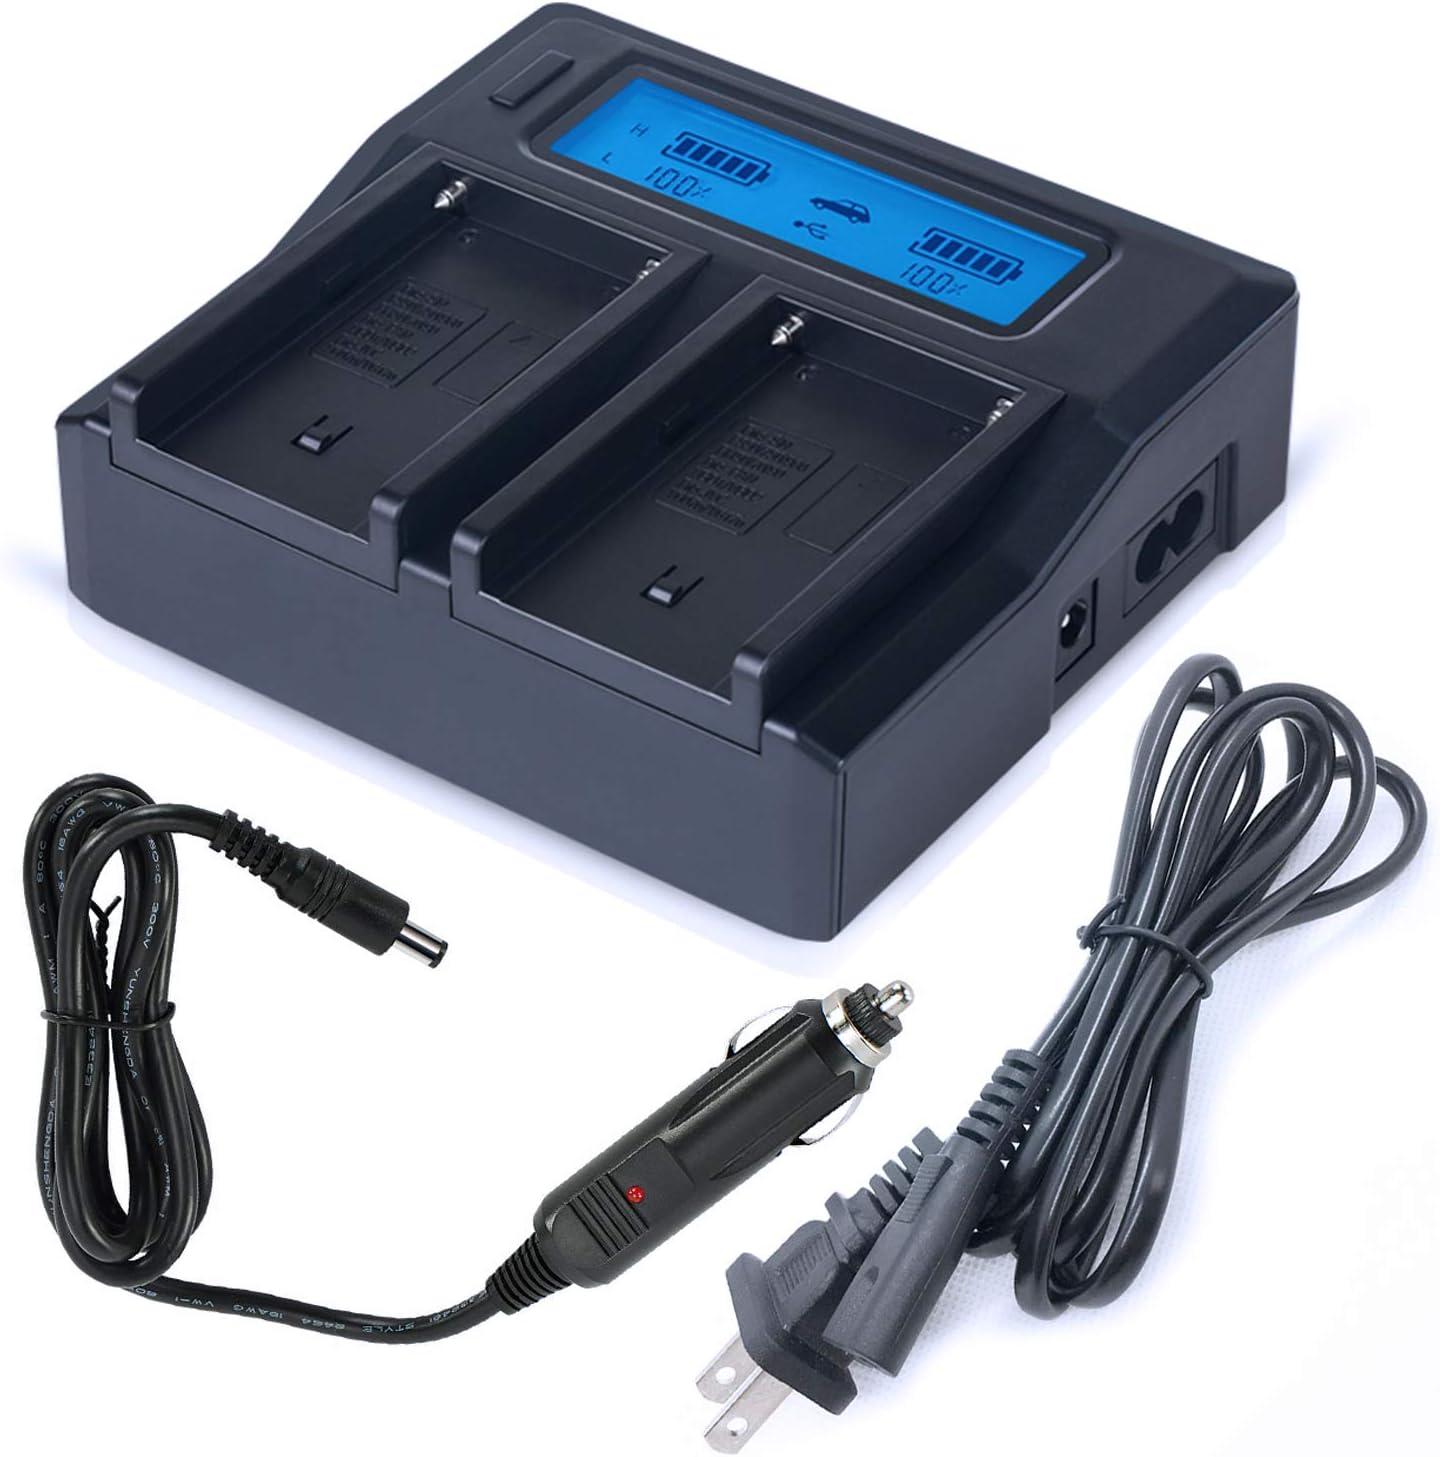 FDR-AXP55 FDR-AX33 Handycam Camcorder FDR-AXP35 Battery for Sony FDR-AXP33 FDR-AX30